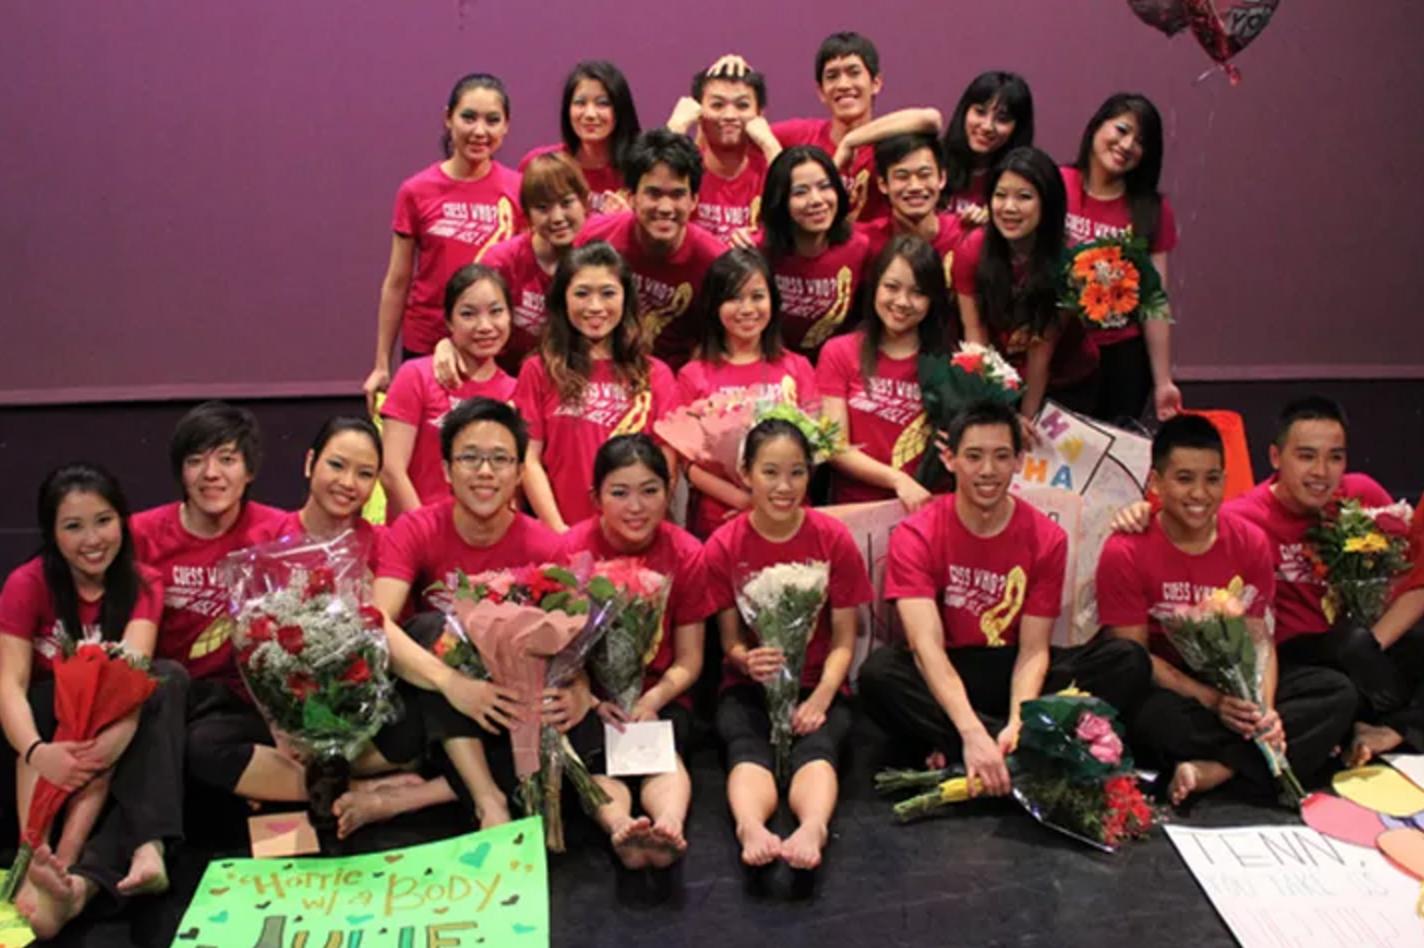 Class of 2012 - Annie Lee, Brian Chiang, Eve Lee, Julie Hoang, Michelle Fang, Nop Jiarathanakul, Teddy Zhang, Tenn Nuchkasem, Thang Thai